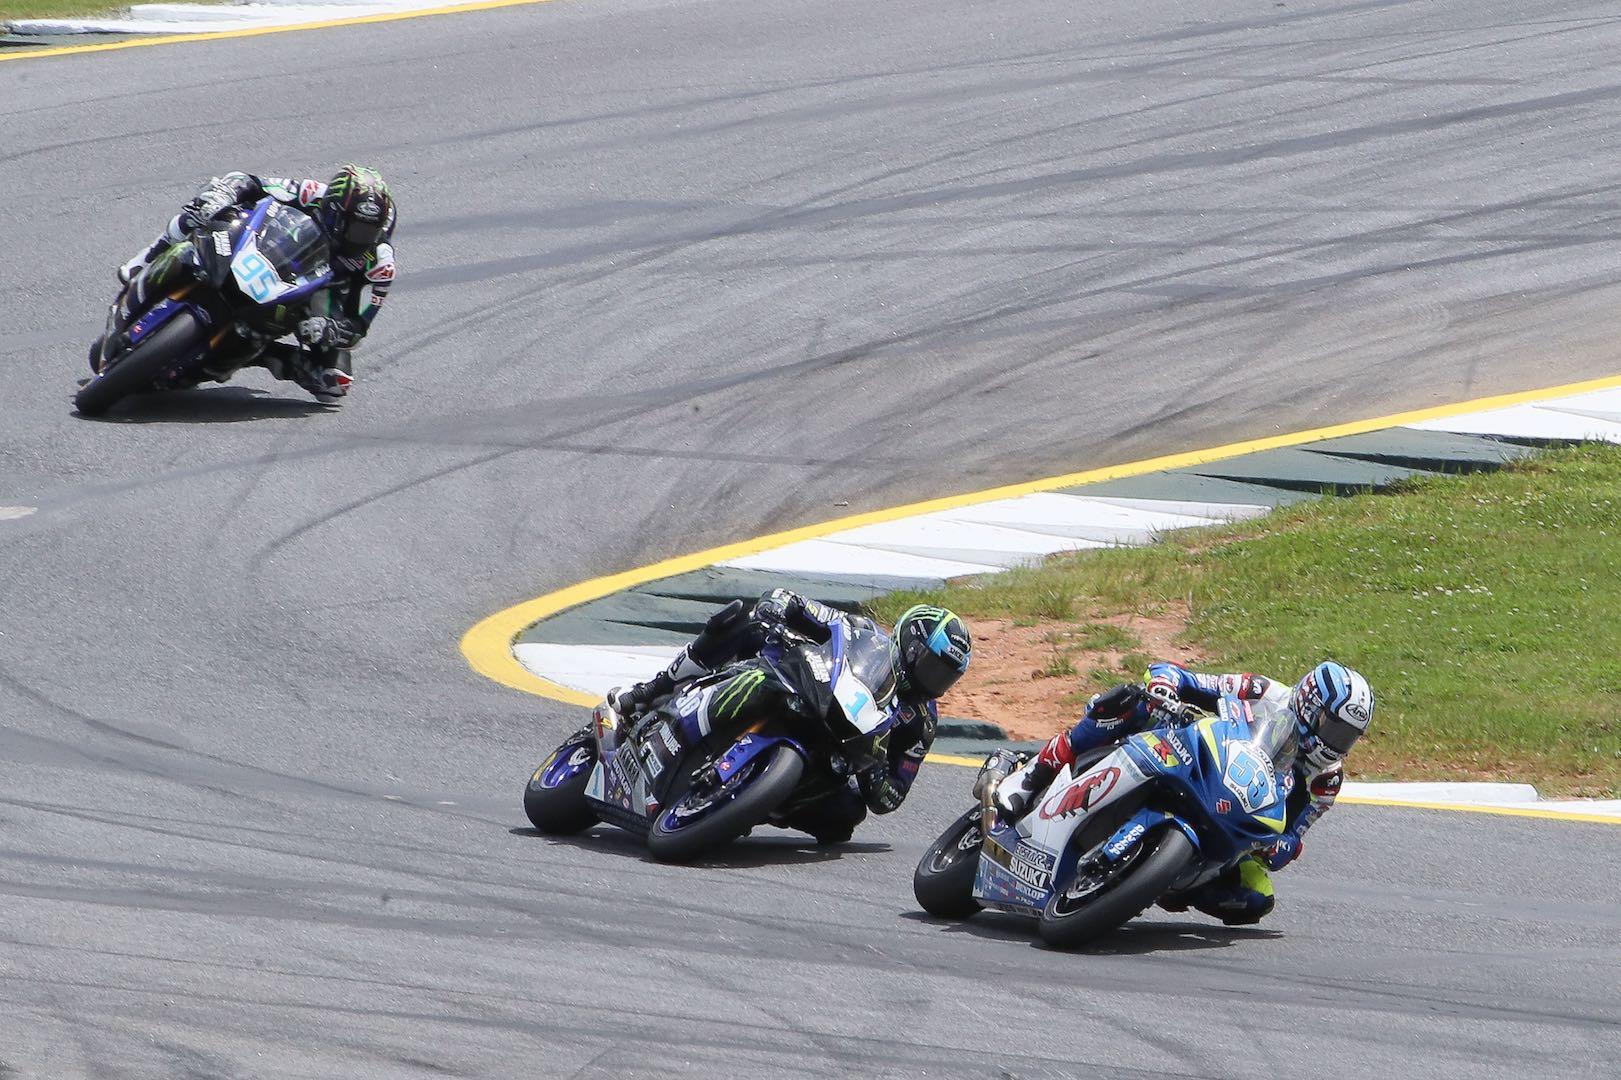 2017 Road Atlanta MotoAmerica Results: Suzuki's Valentine Debise leads Supersport class